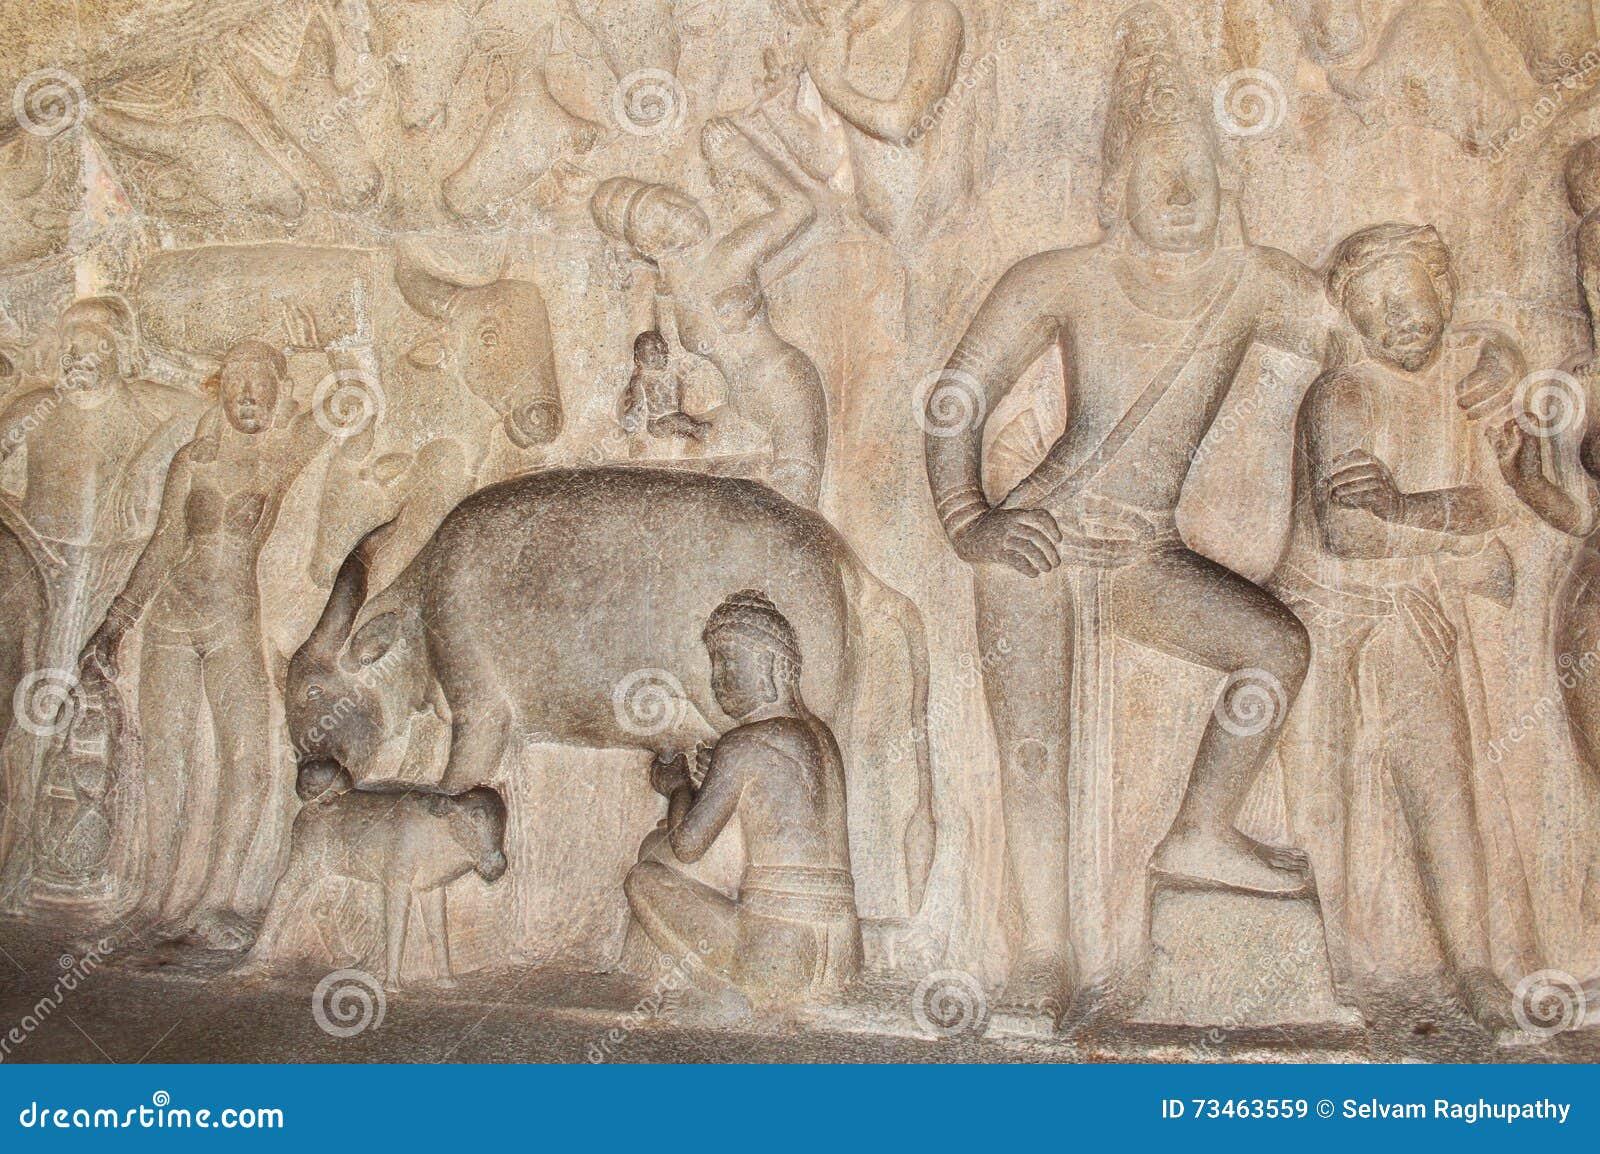 Mahabalipuram Cave Sculpture Stock Image - Image of culture